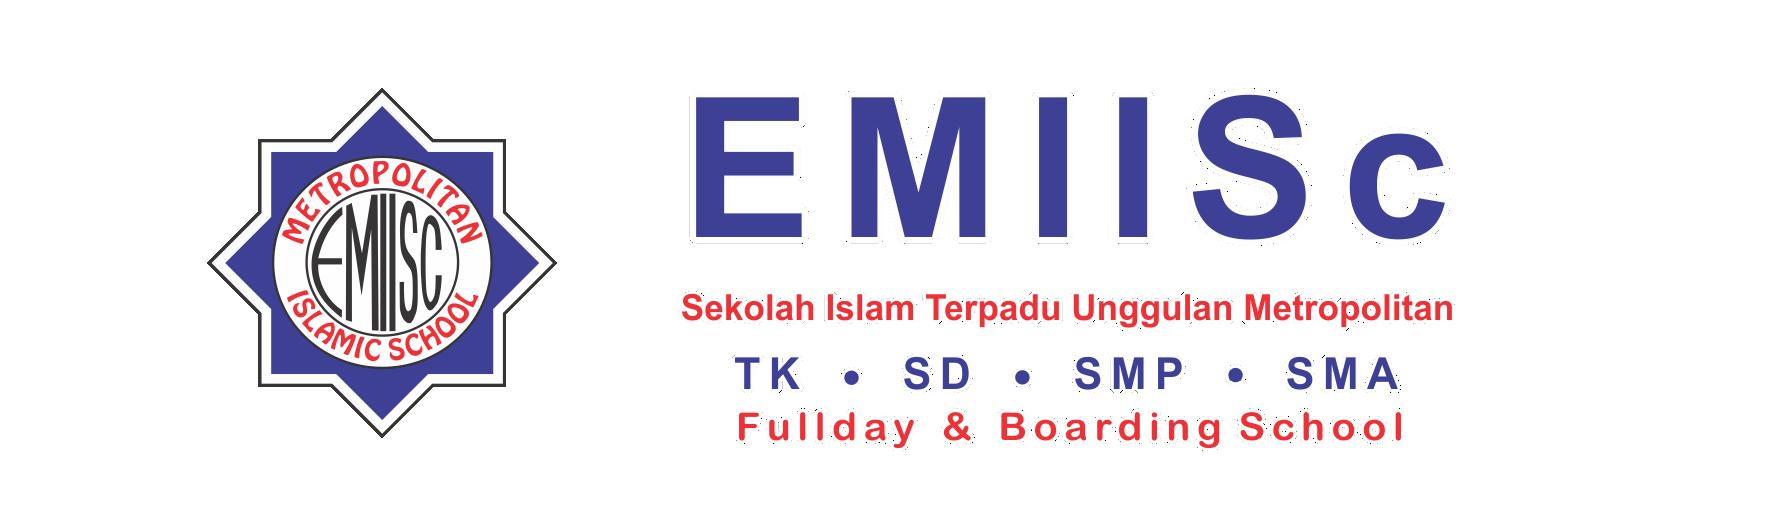 Sekolah Islam Terpadu Unggulan Metropolitan EMIISc